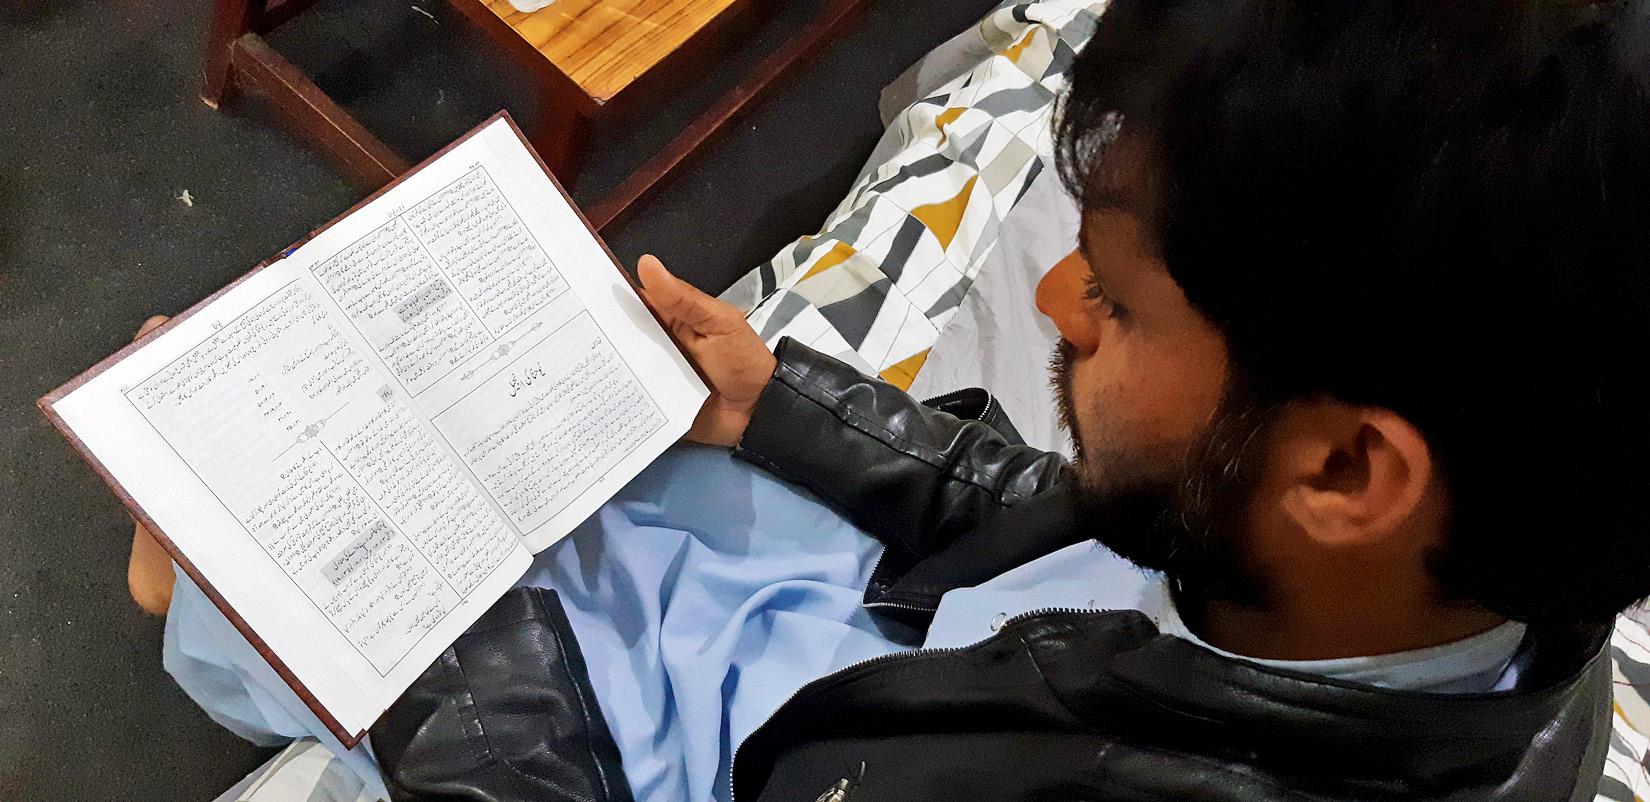 FMI supports Pakistani believers facing persecution